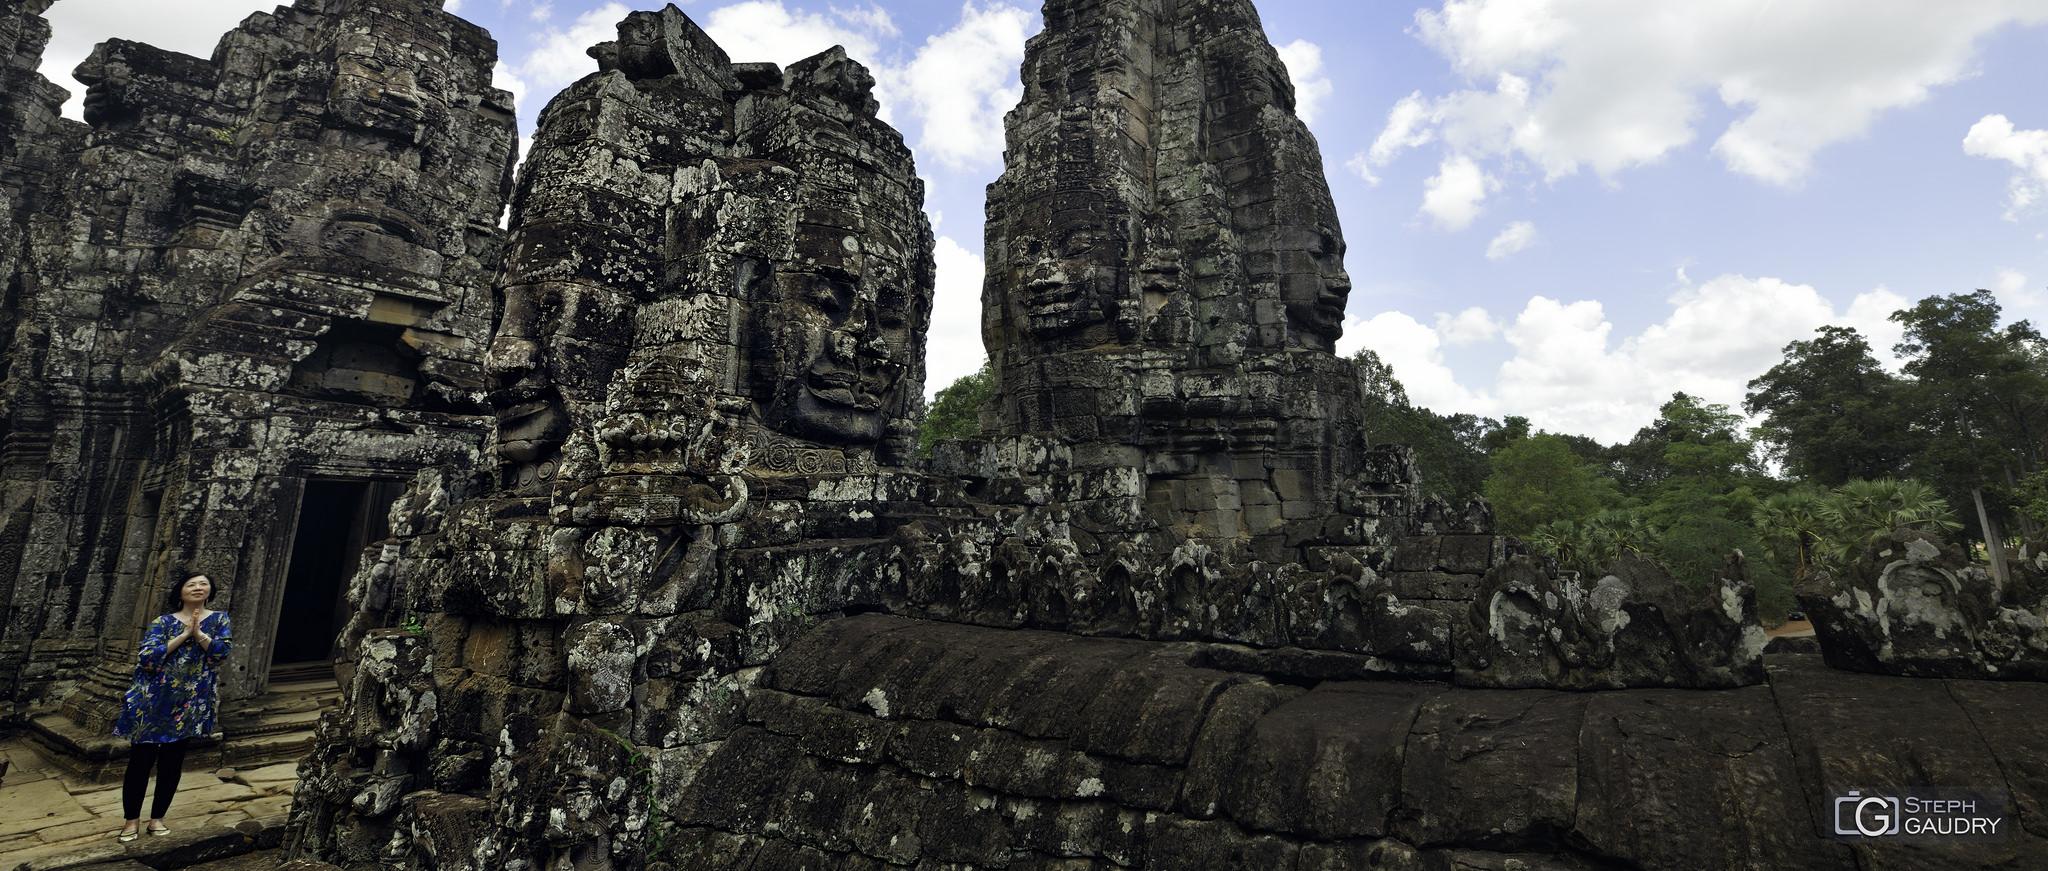 Angkor Thom [Klik om de diavoorstelling te starten]